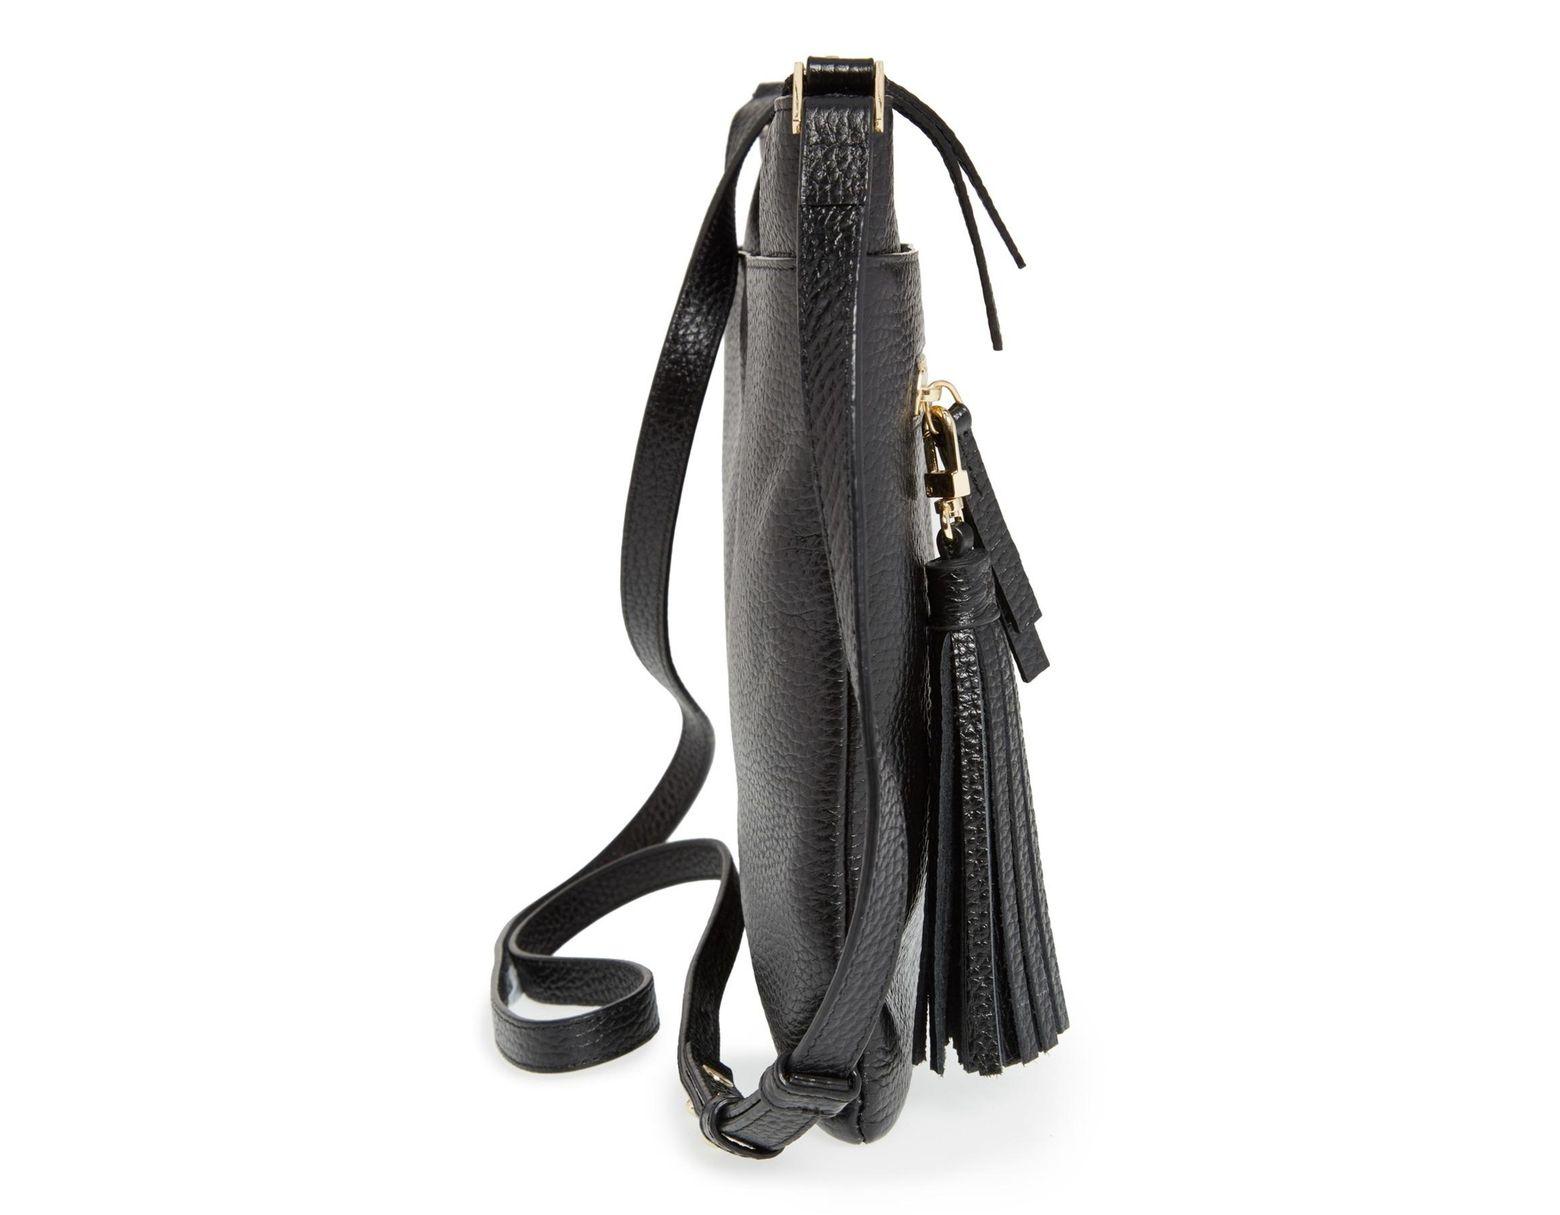 a3fed1edfc Halogen Tasseled Leather Crossbody Bag in Black - Lyst